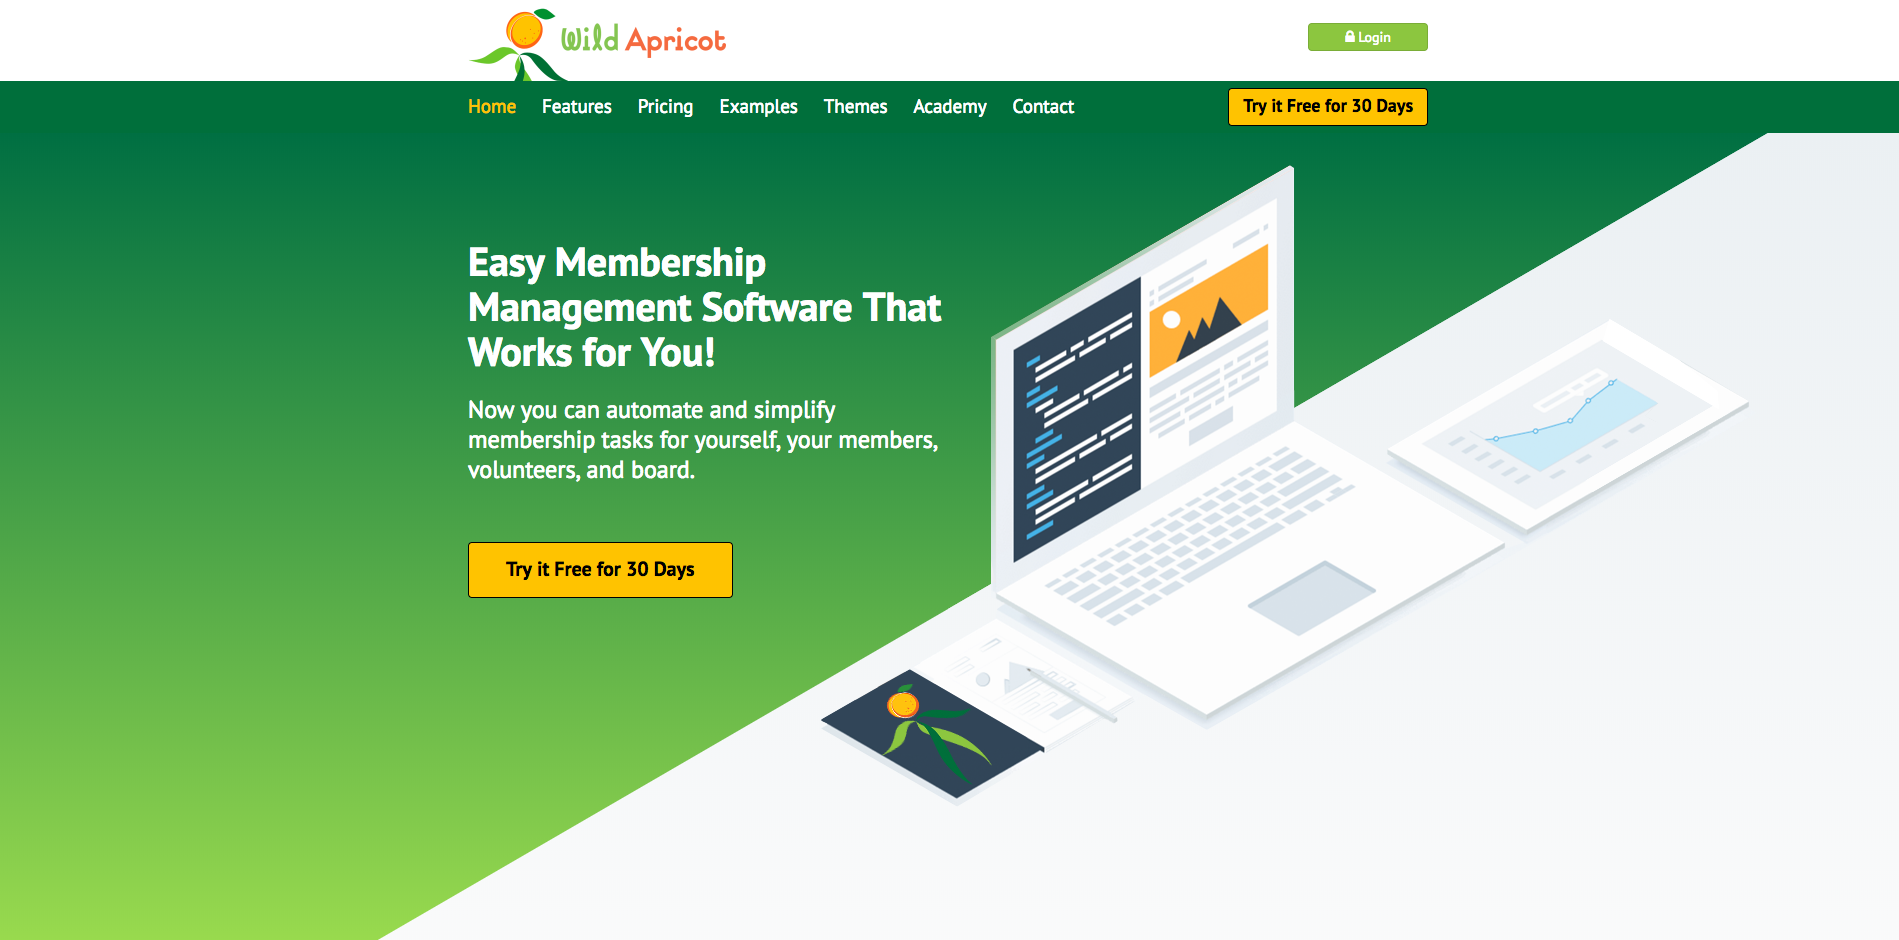 Wild Apricot Homepage Screenshot